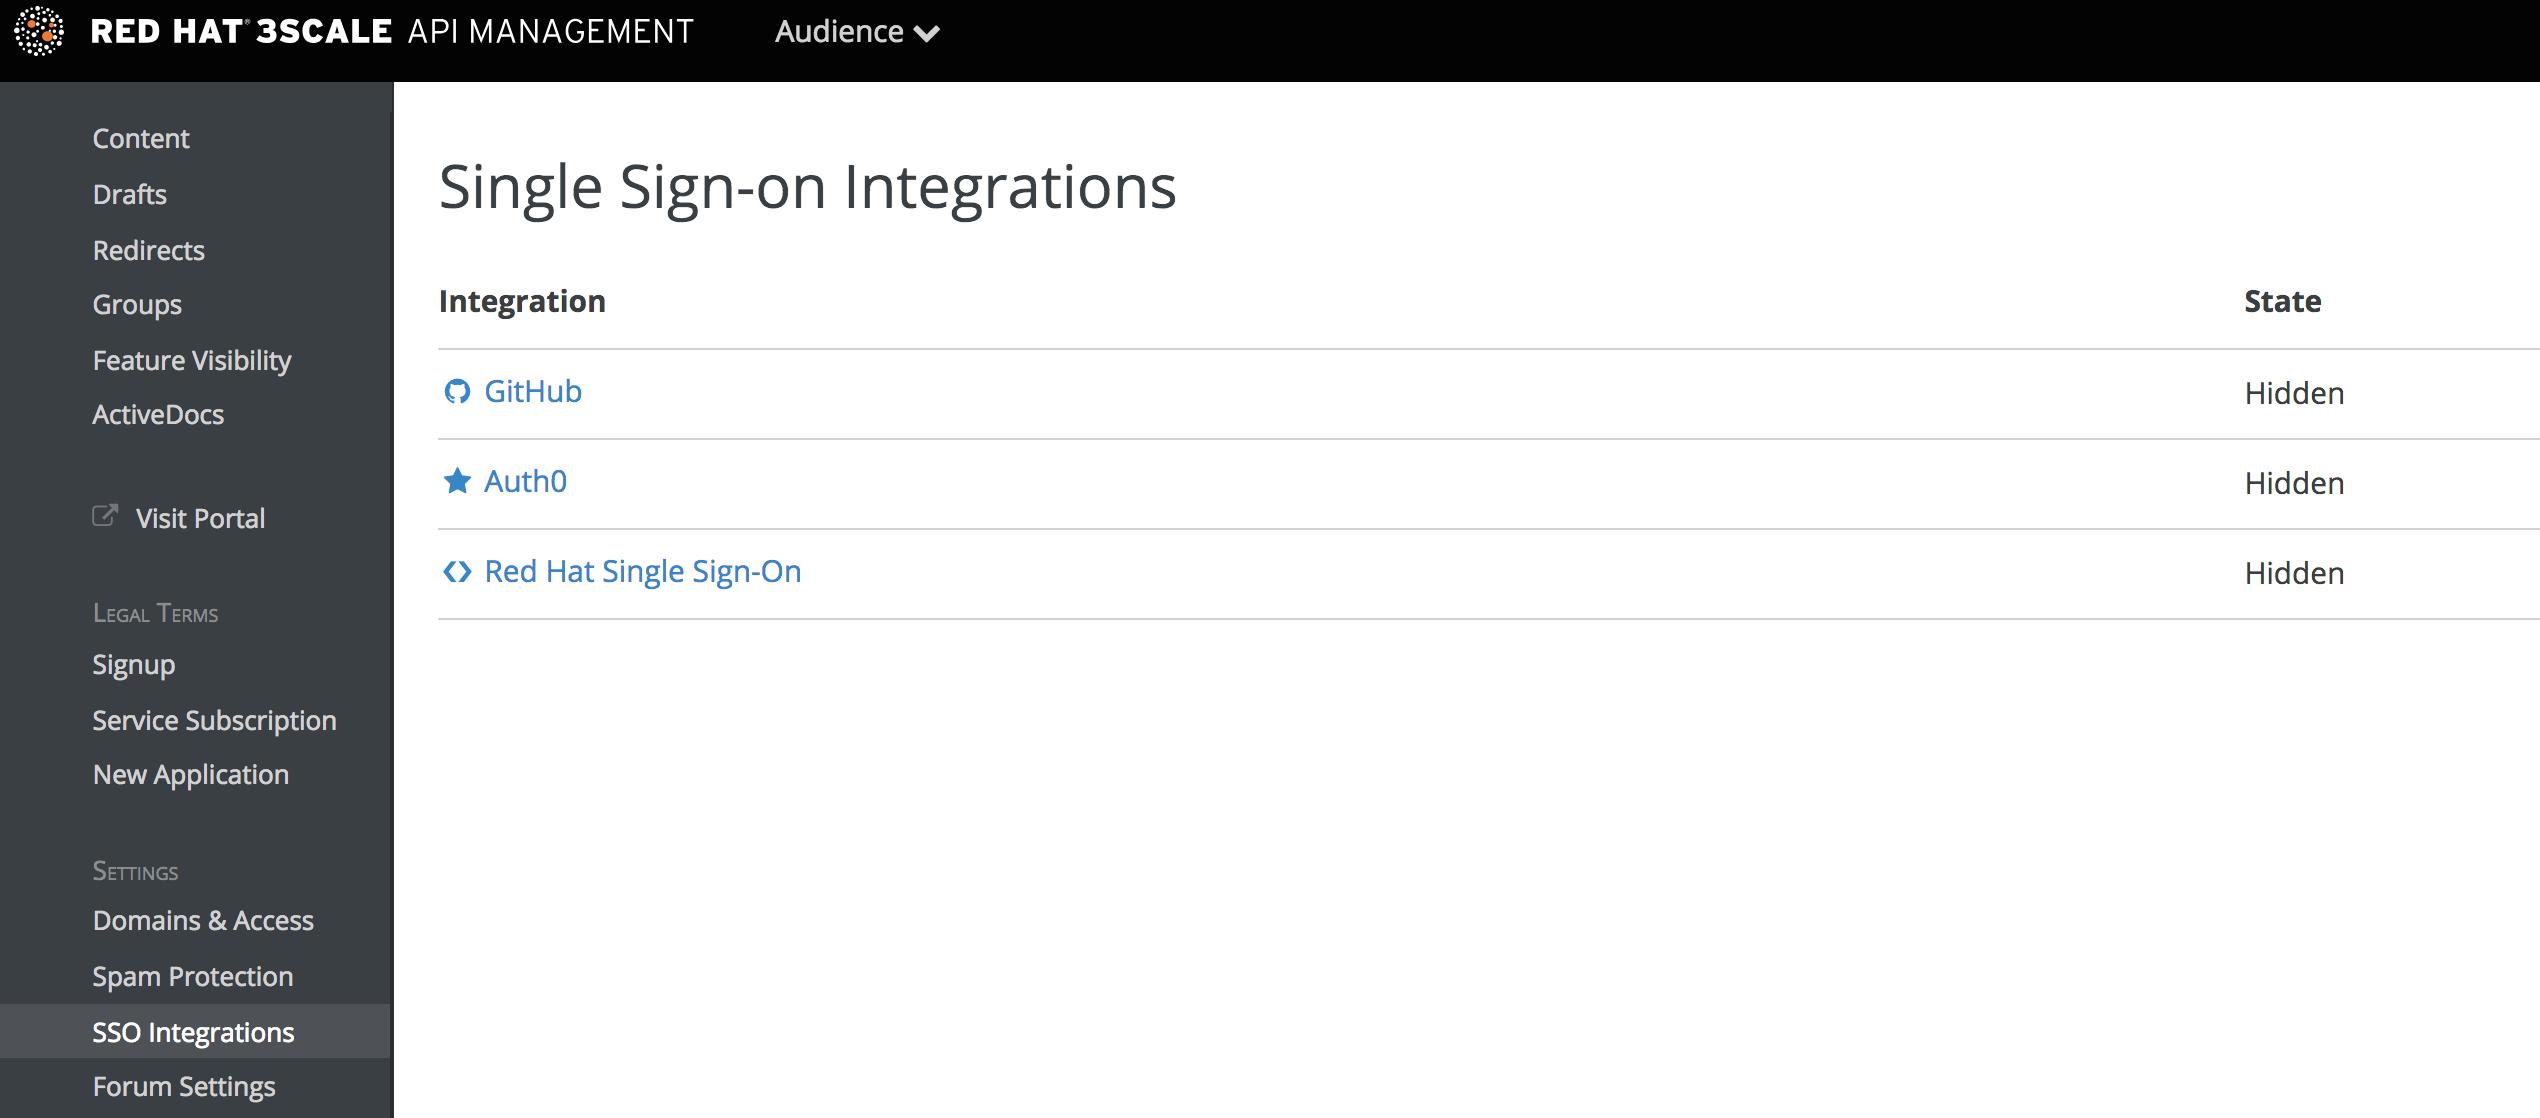 SSO integrations